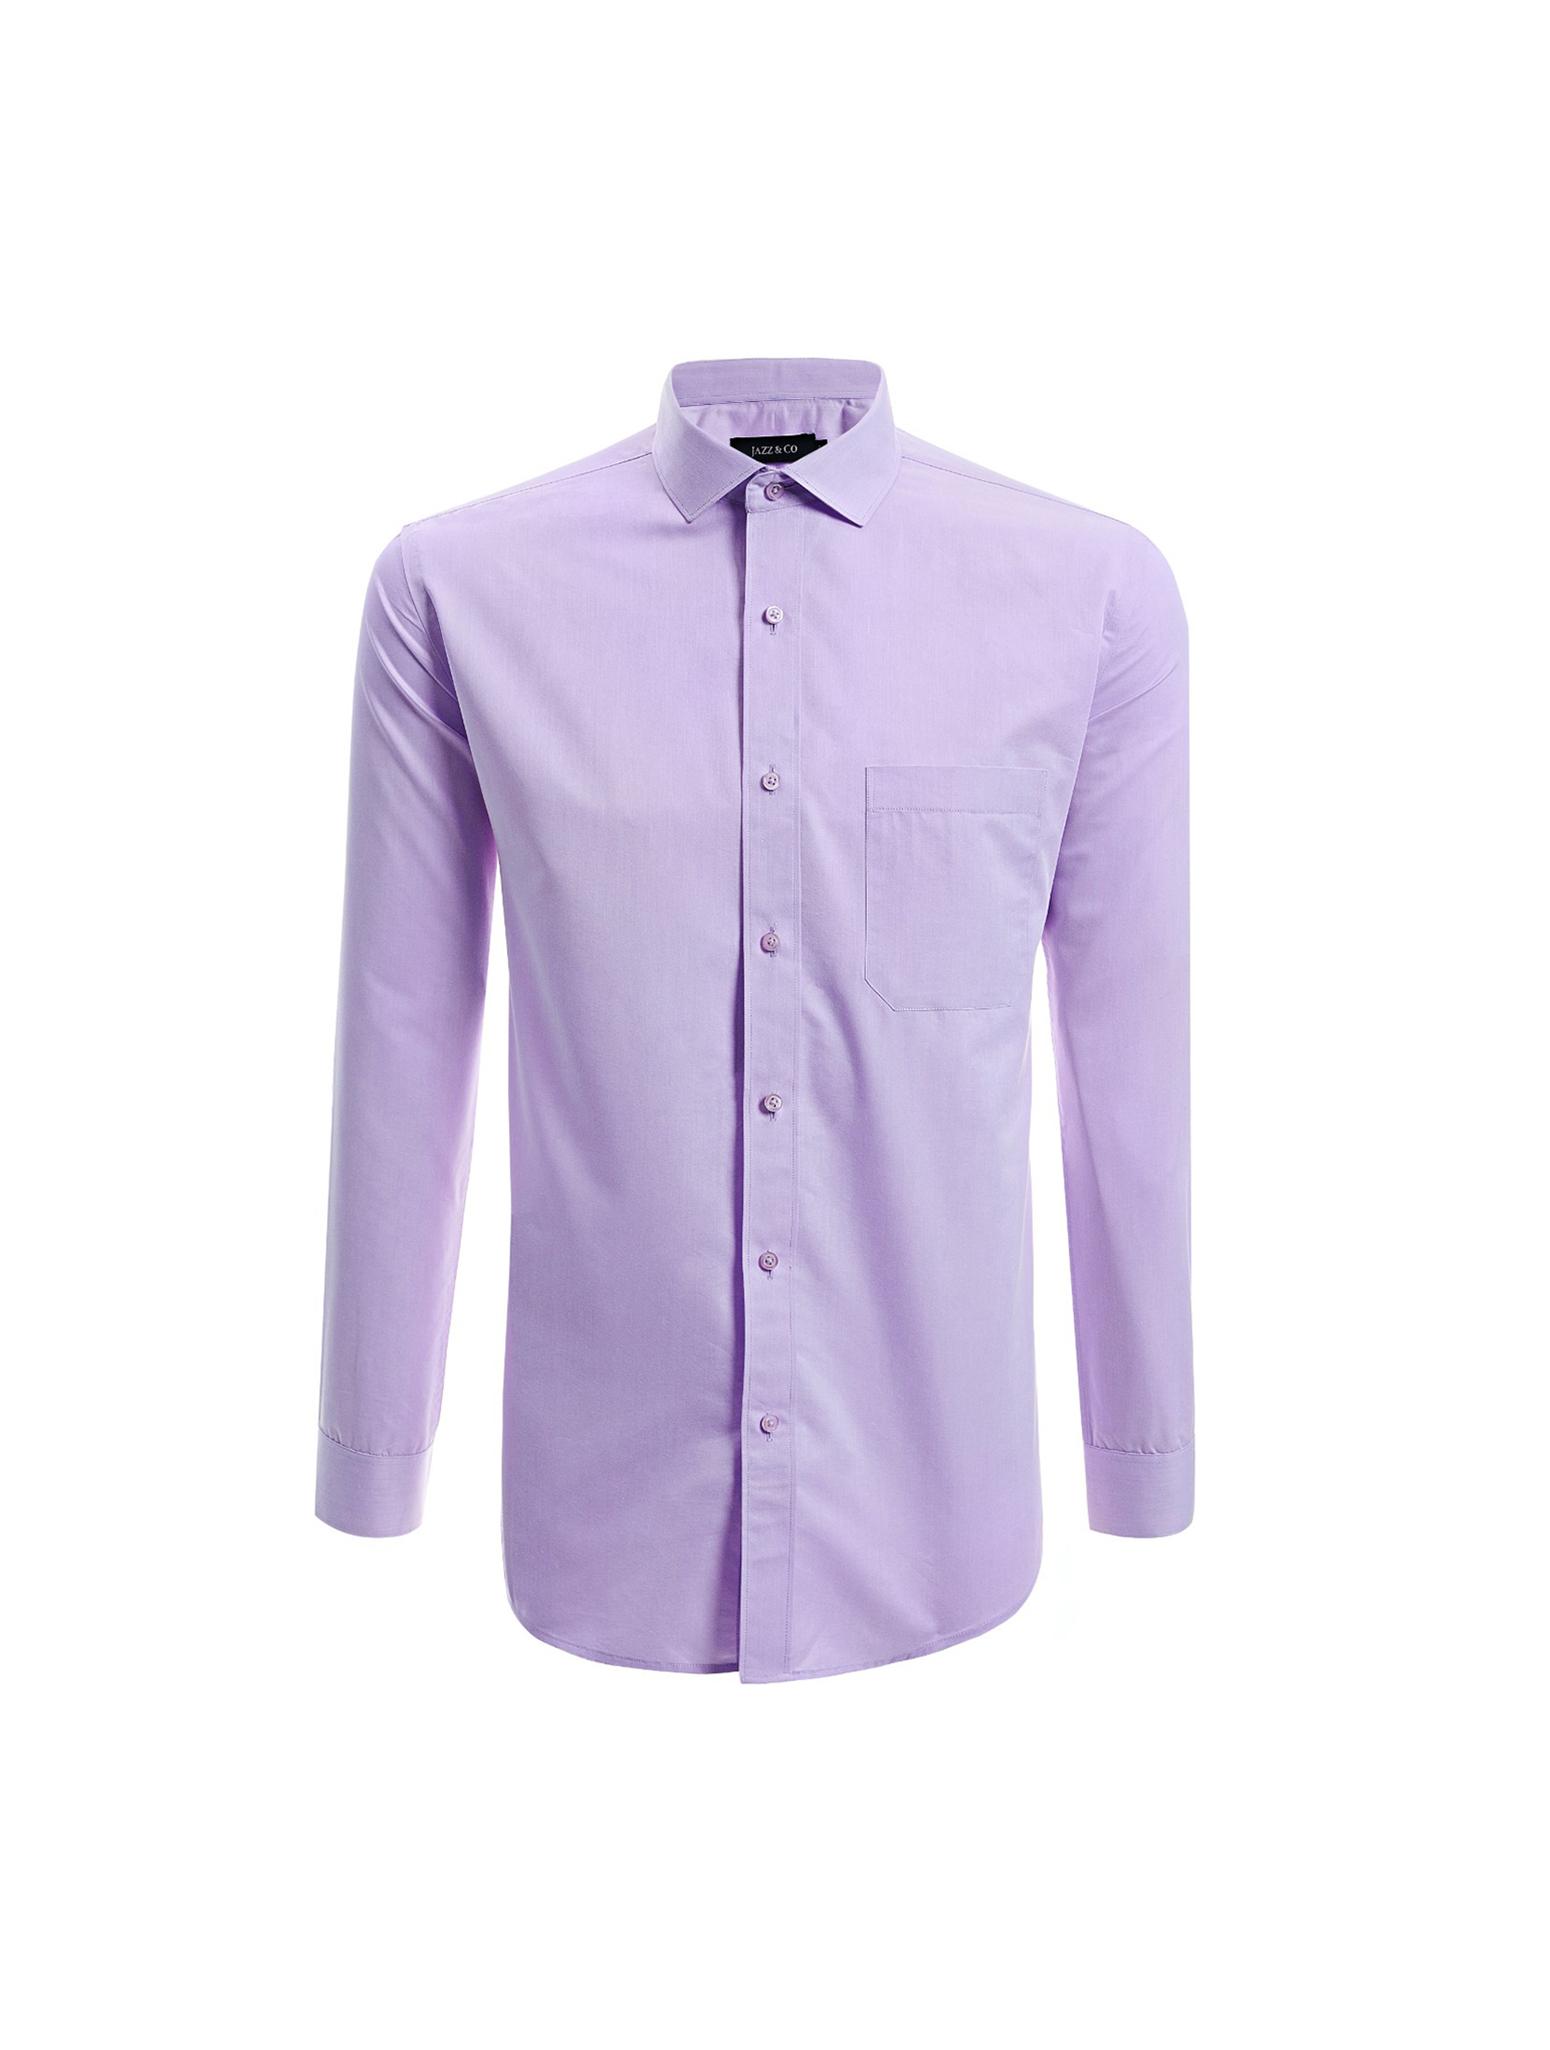 light purple long sleeve shirt south park t shirts